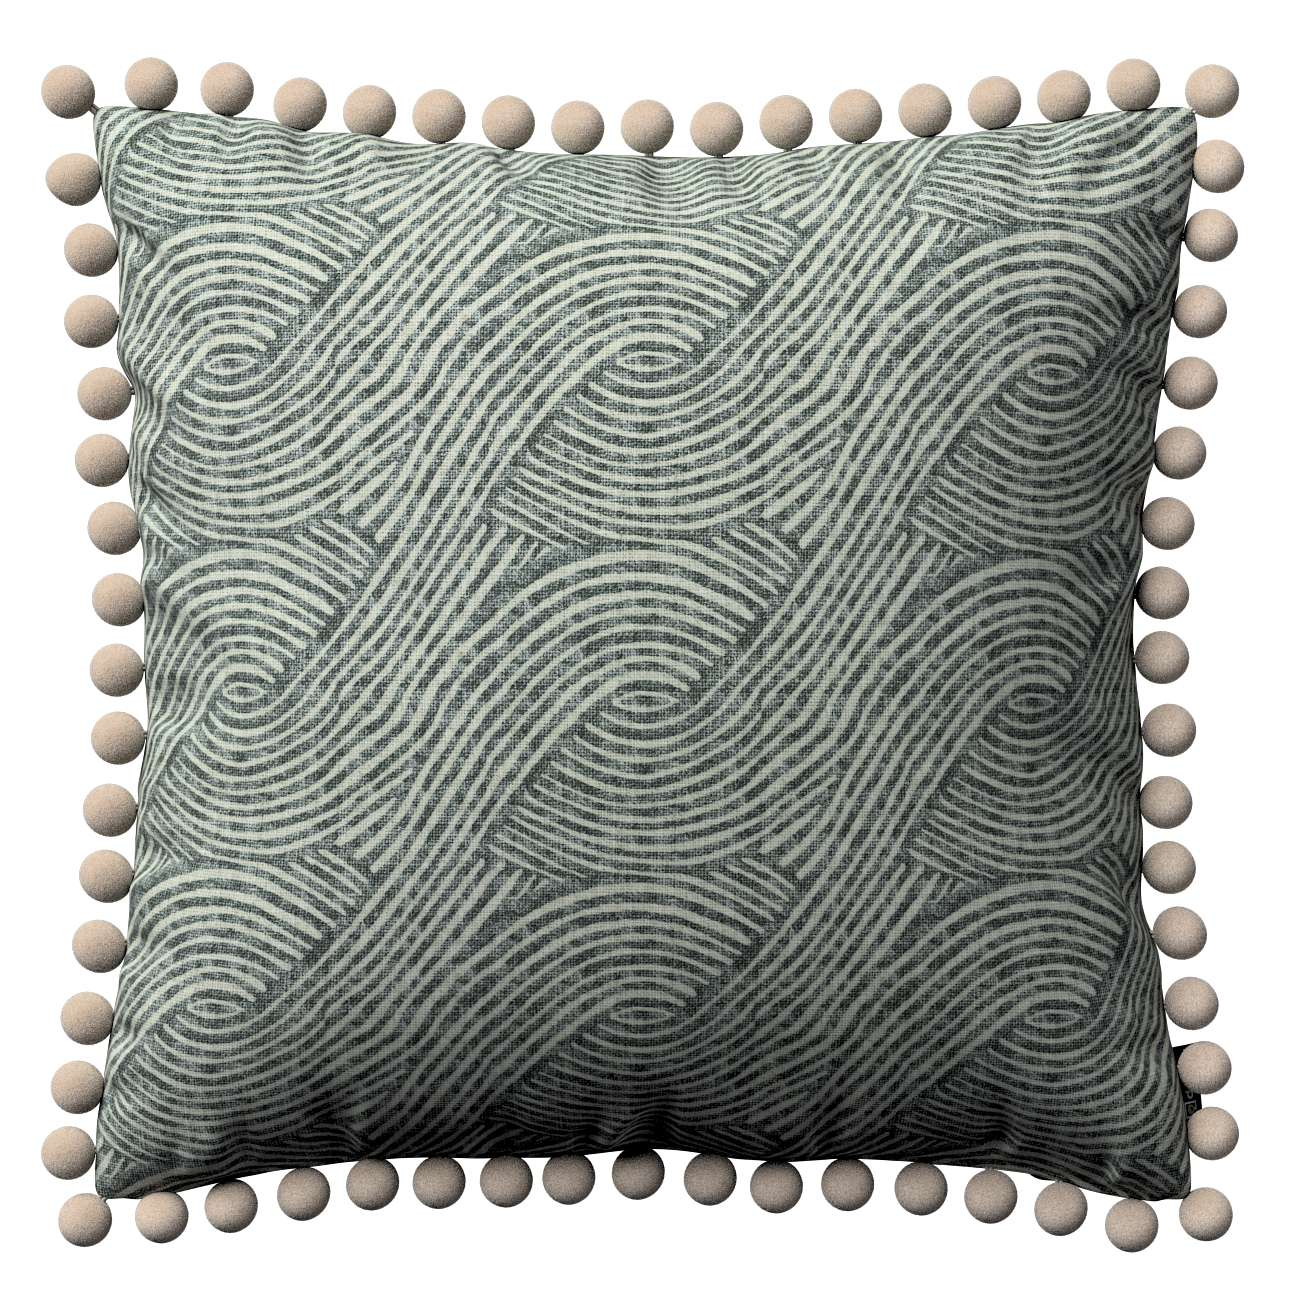 Poszewka Wera na poduszkę w kolekcji Comics, tkanina: 143-13